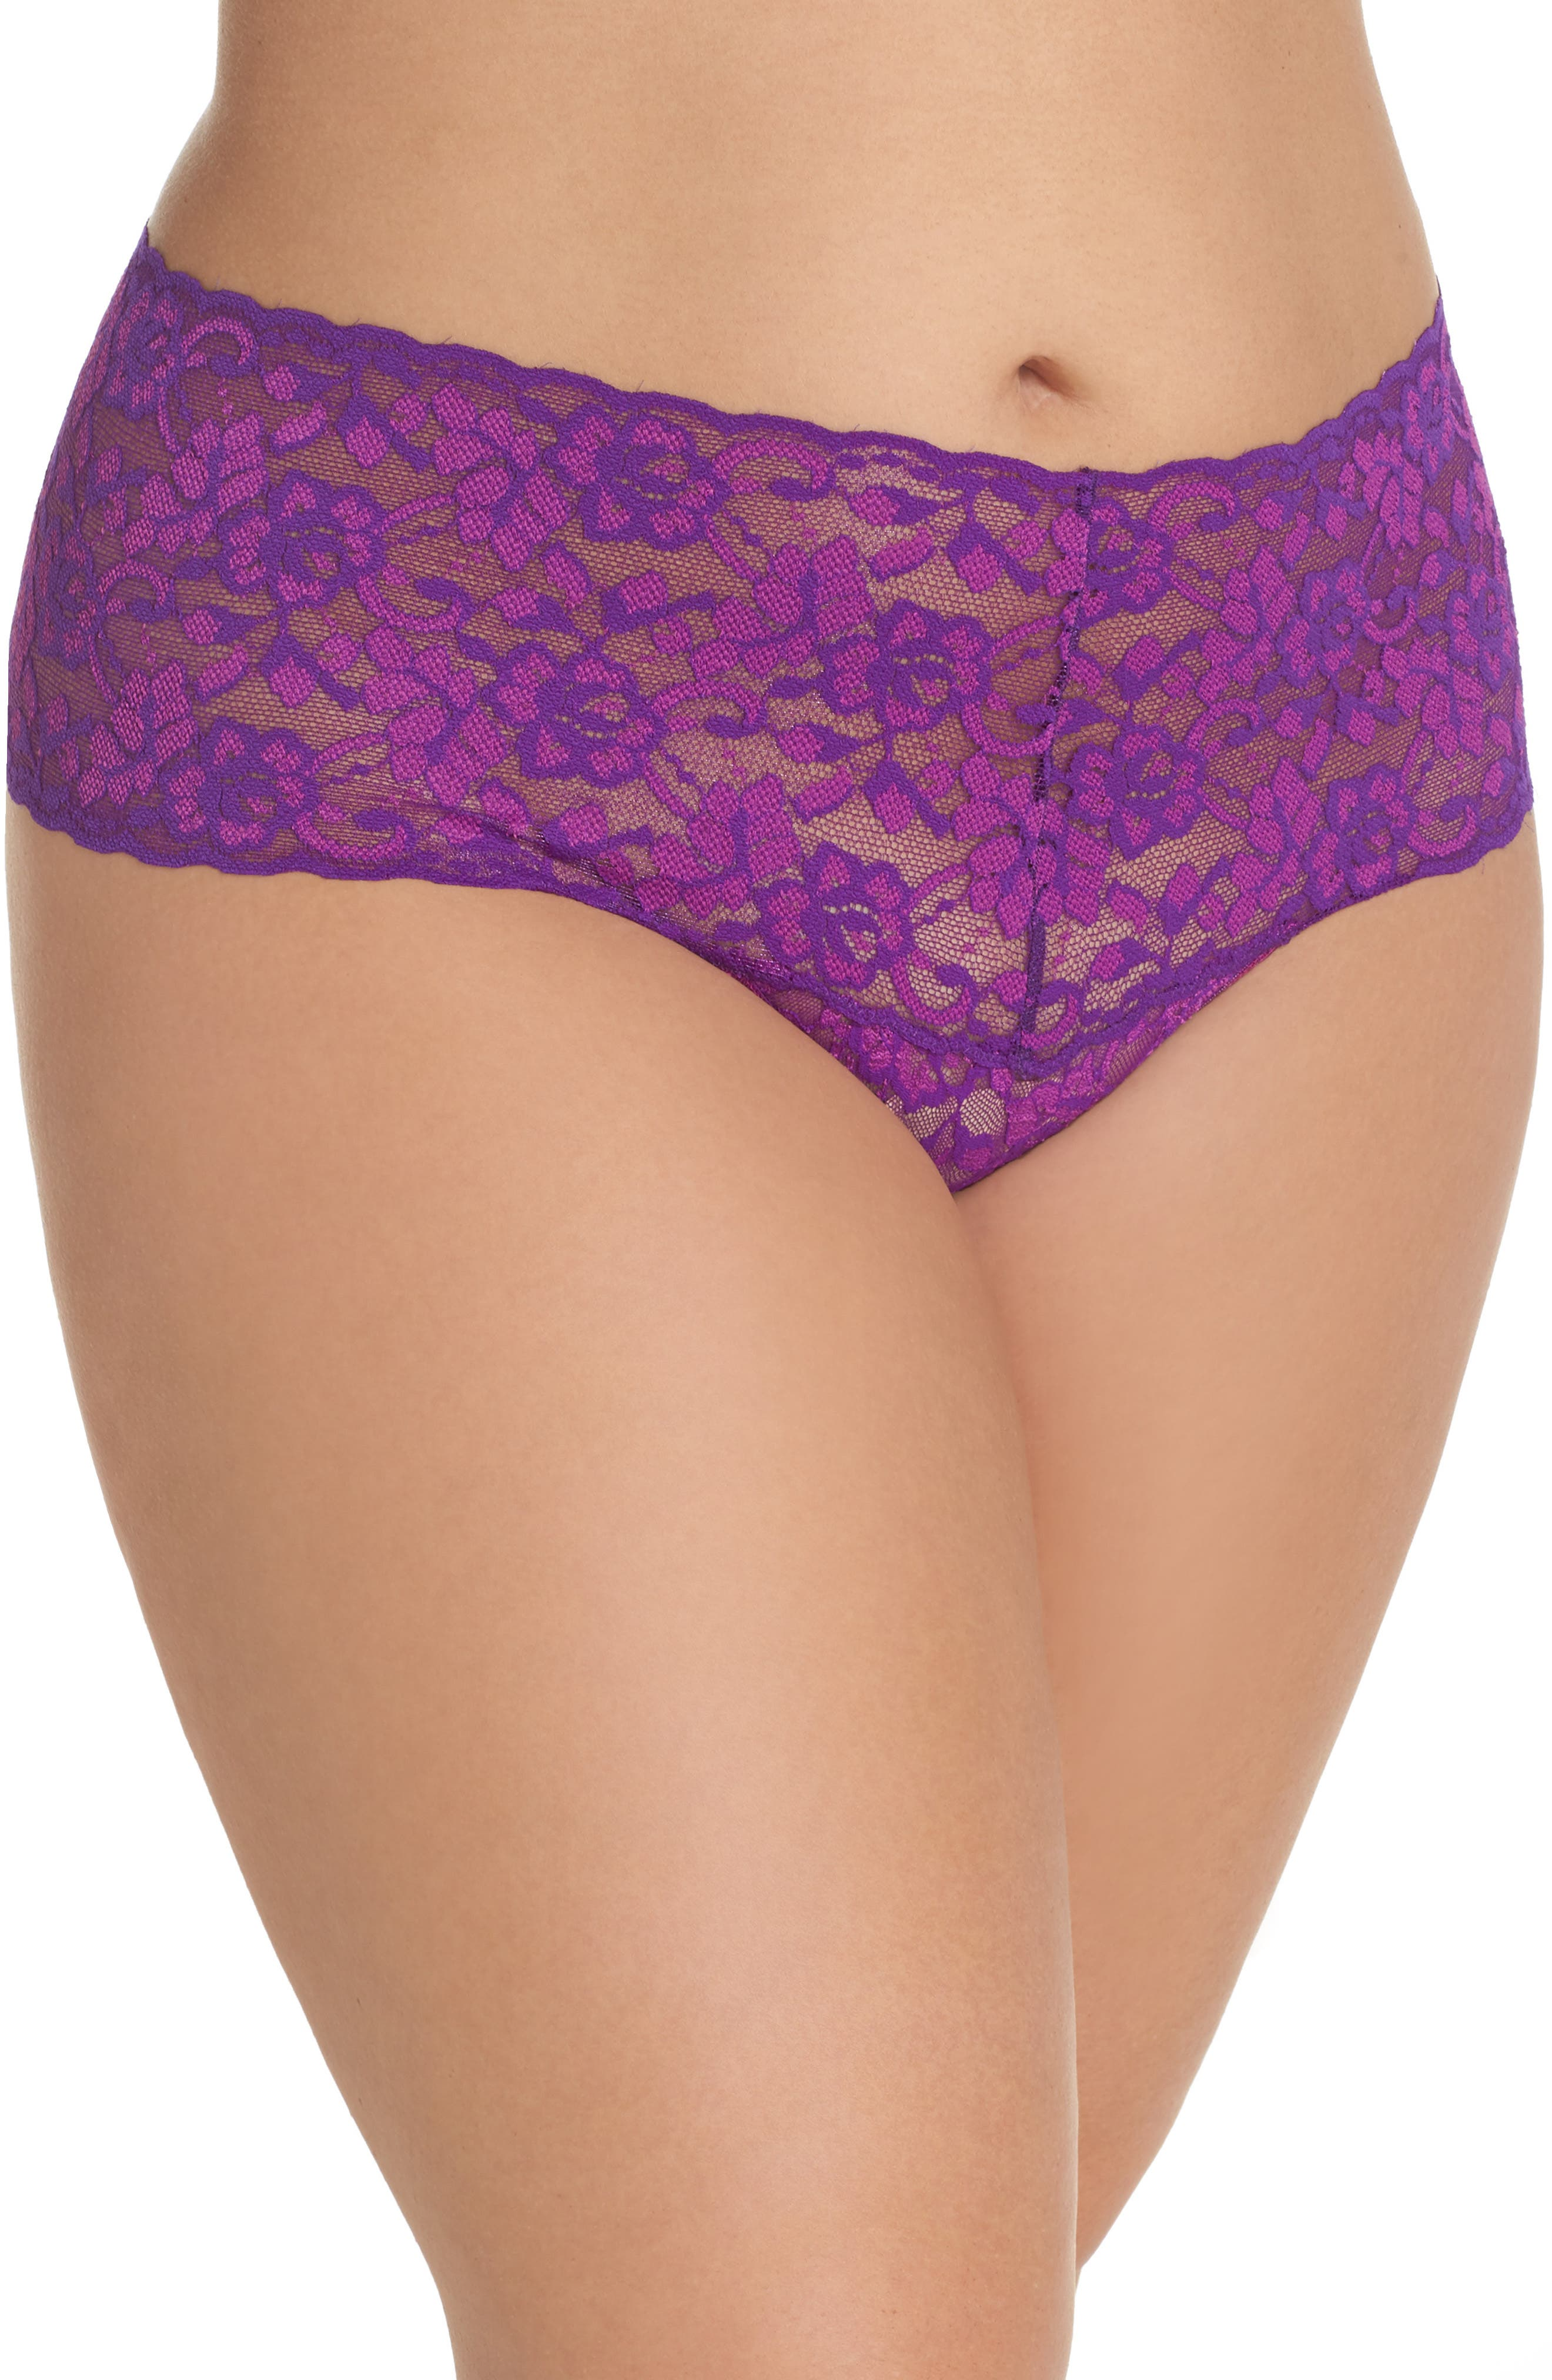 Alternate Image 1 Selected - Hanky Panky Cross Dye Lace Retro Thong (Plus Size)